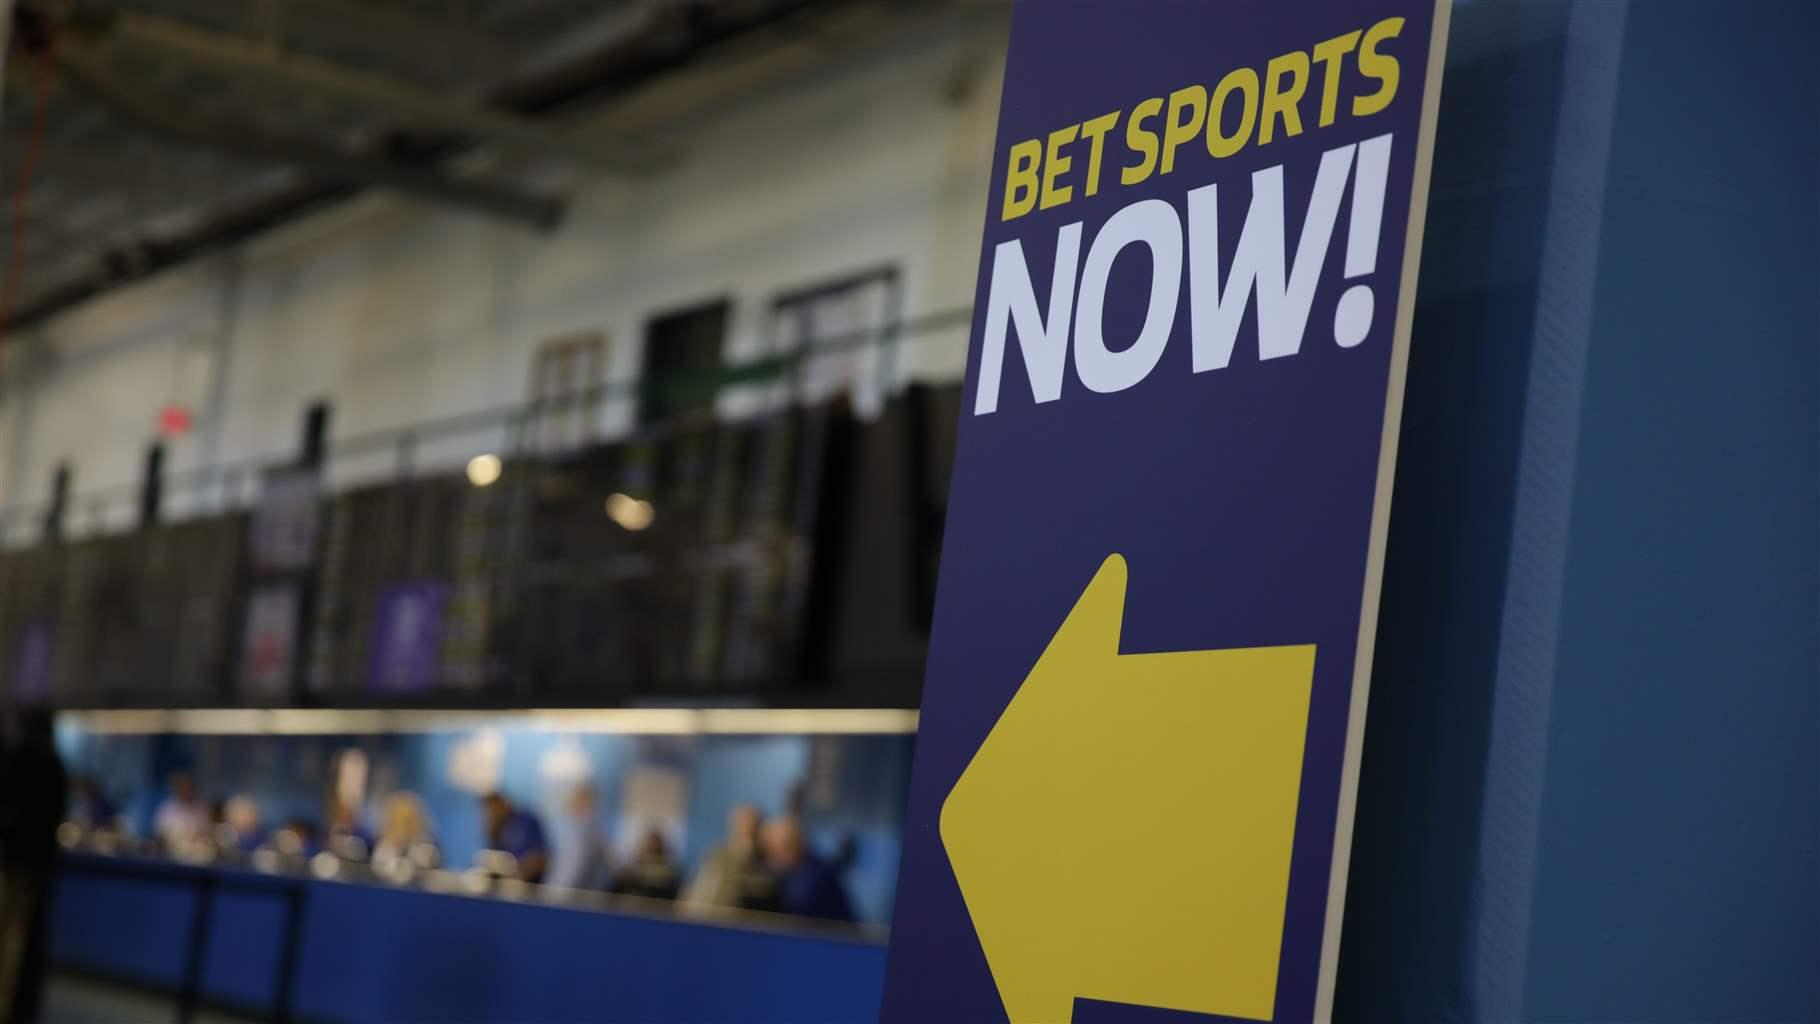 World sports betting fixture download